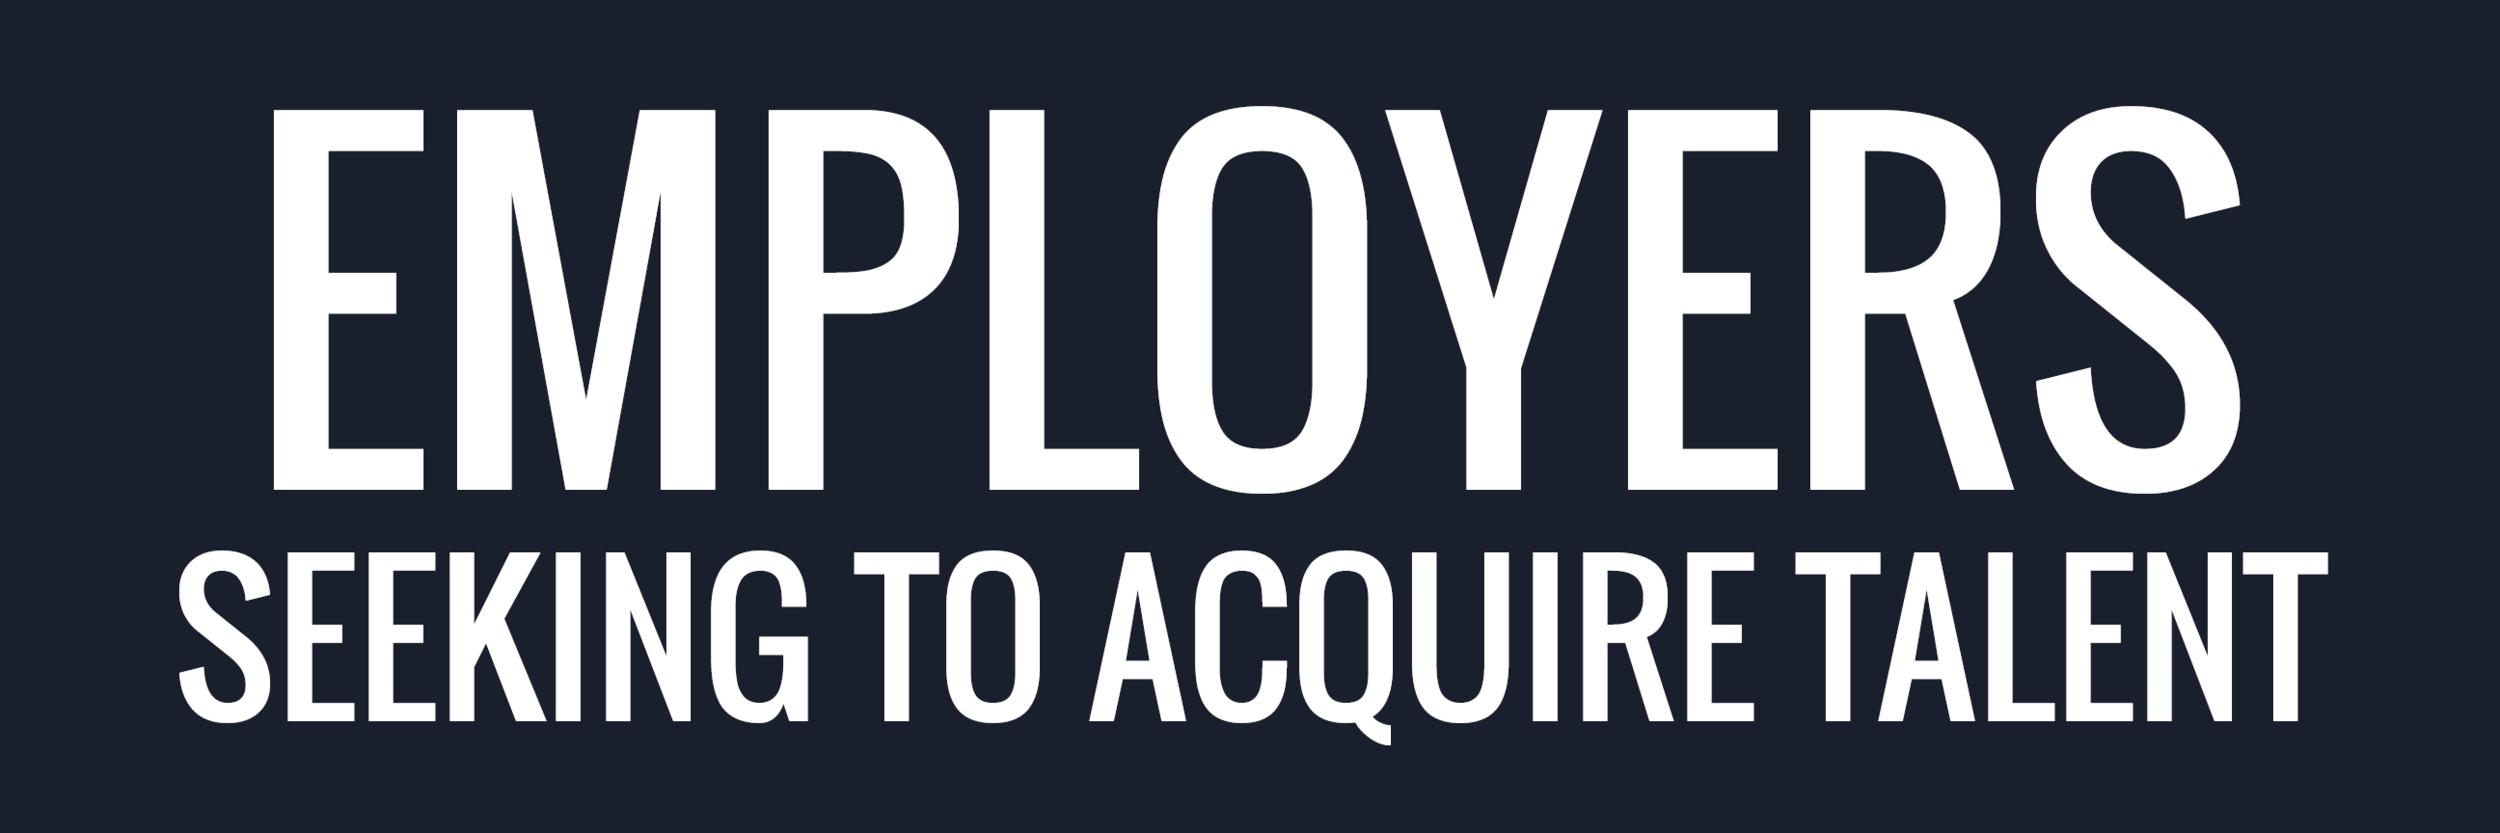 Employer button flip.png